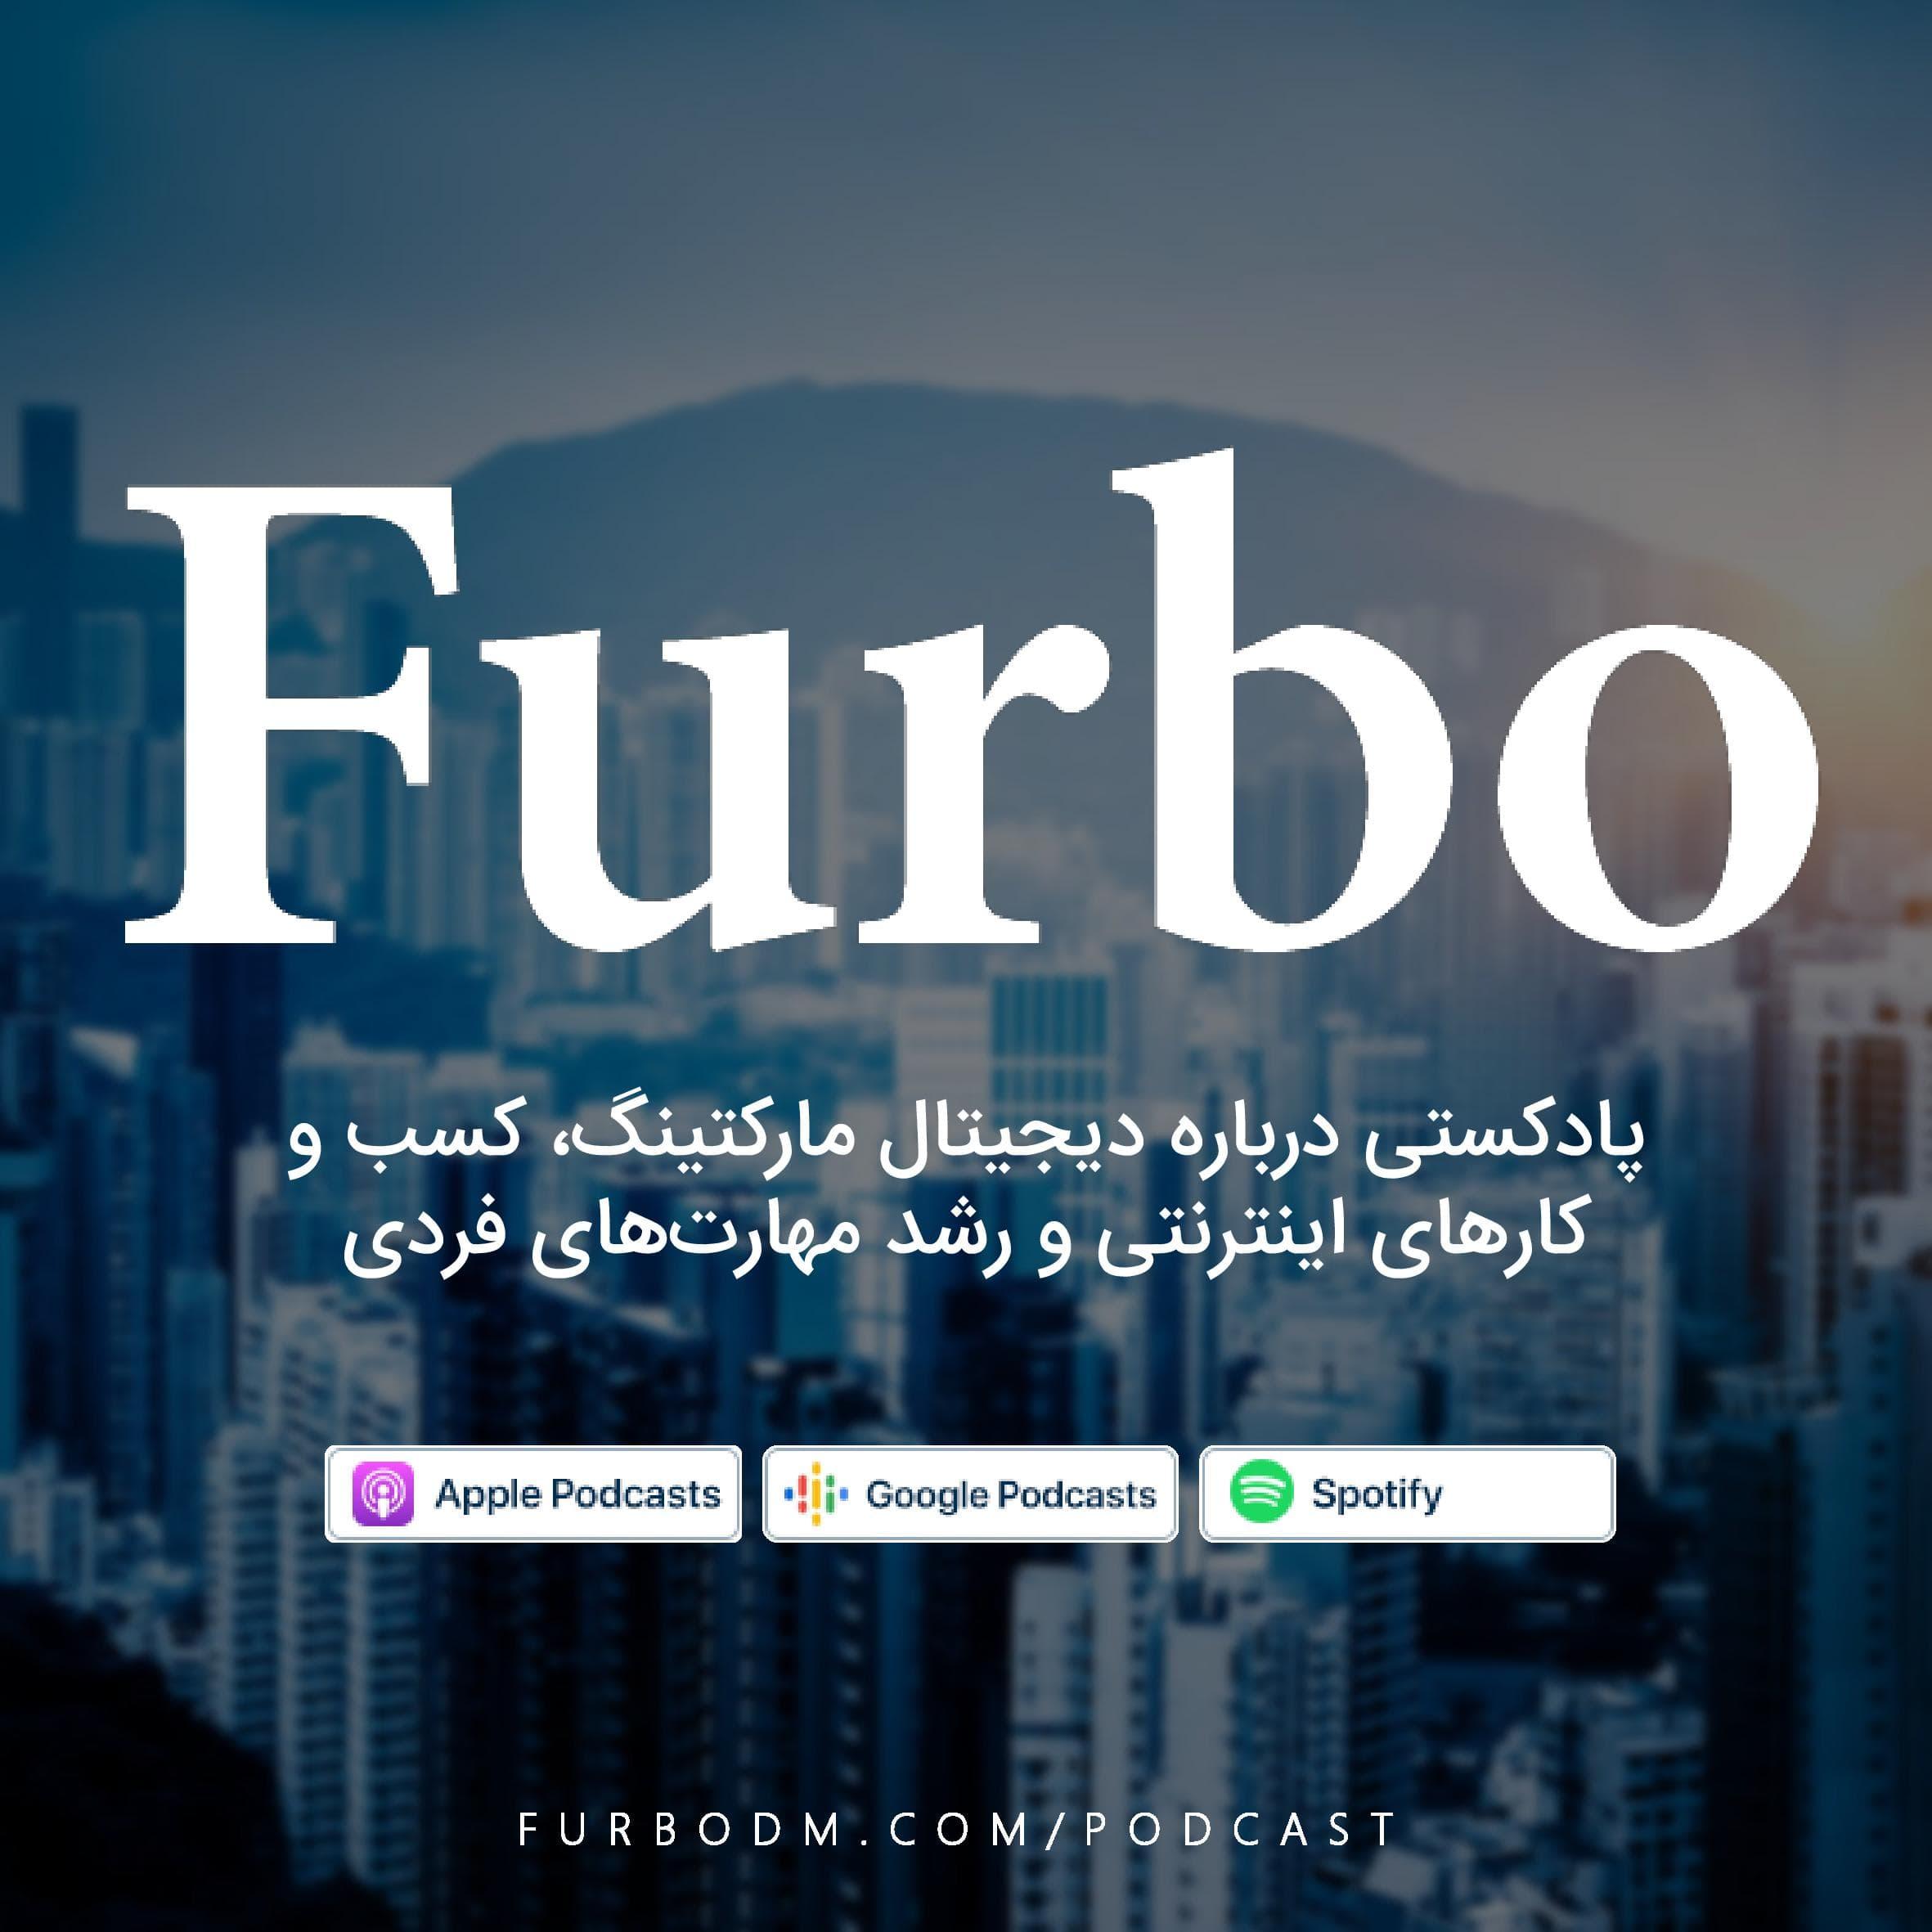 پادکست فارسی فوربو